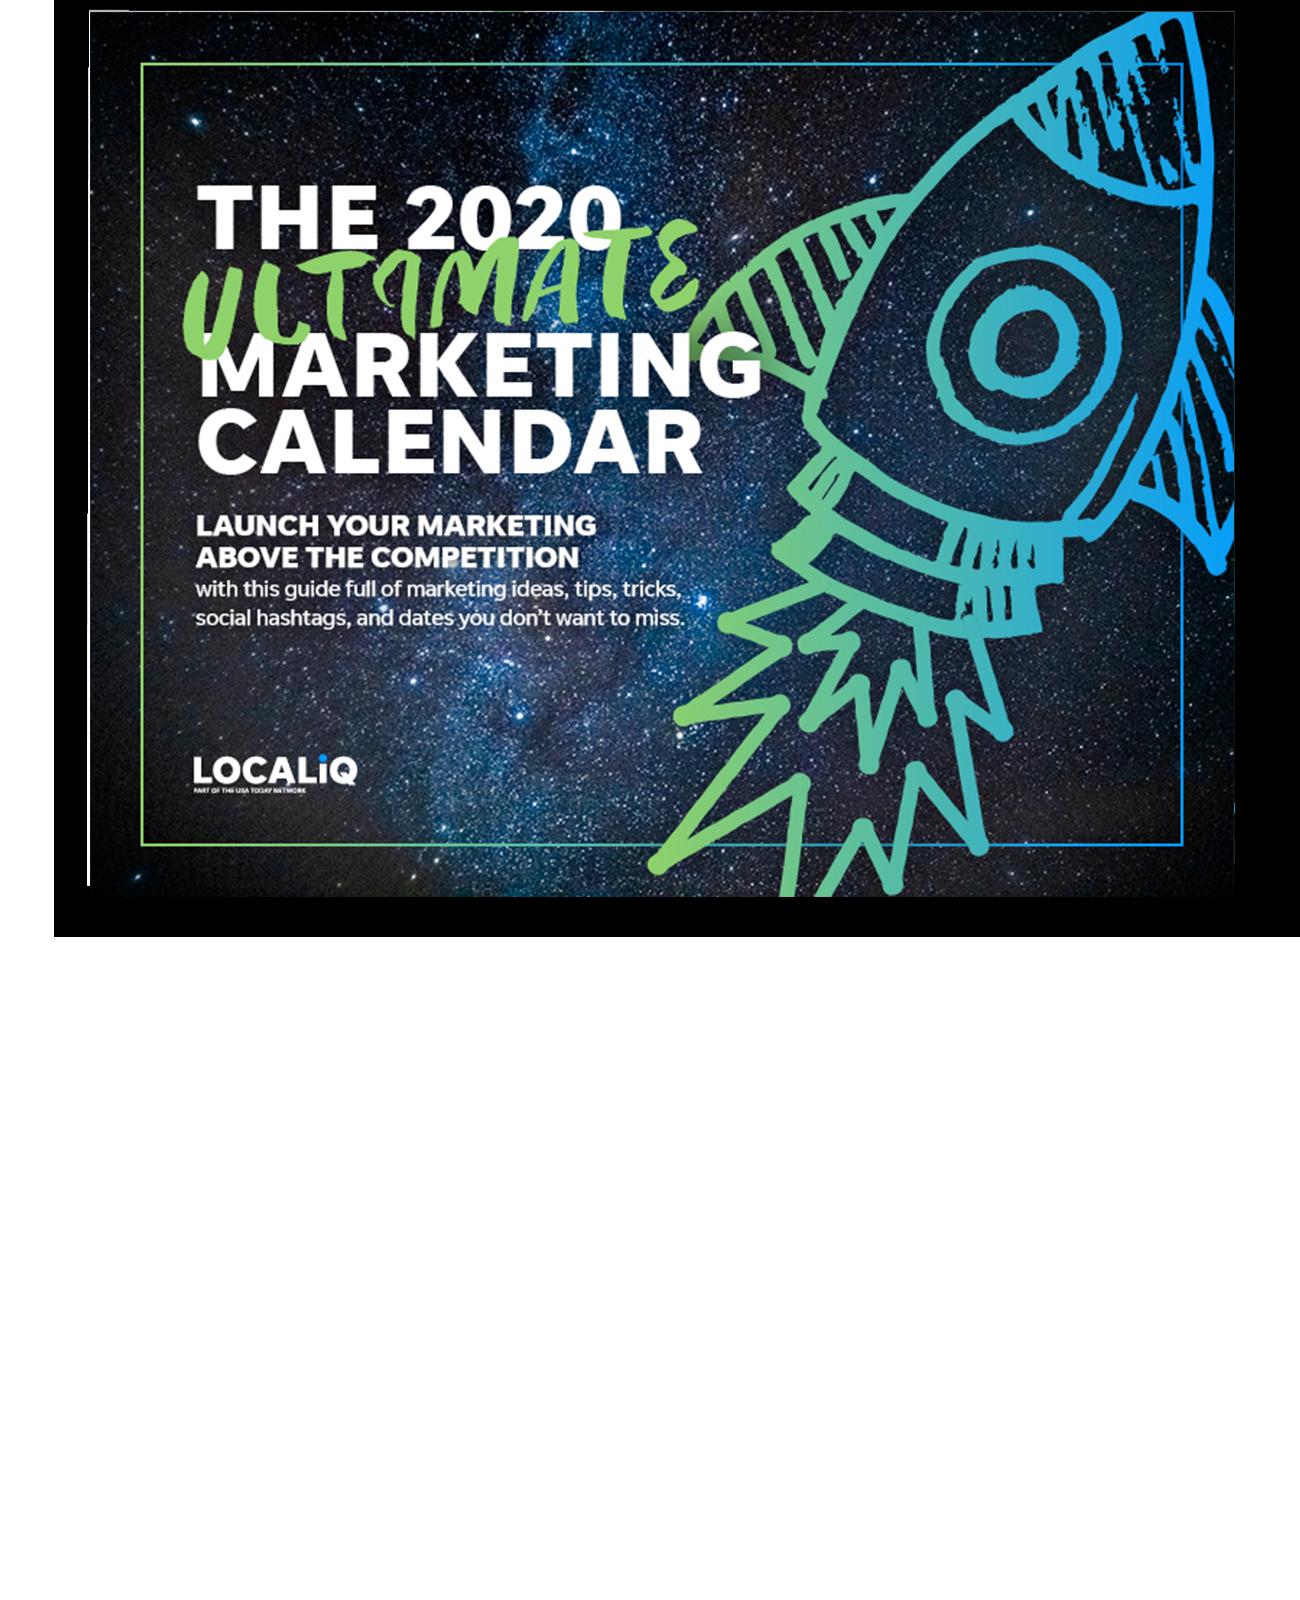 The 2020 Ultimate Marketing Calendar